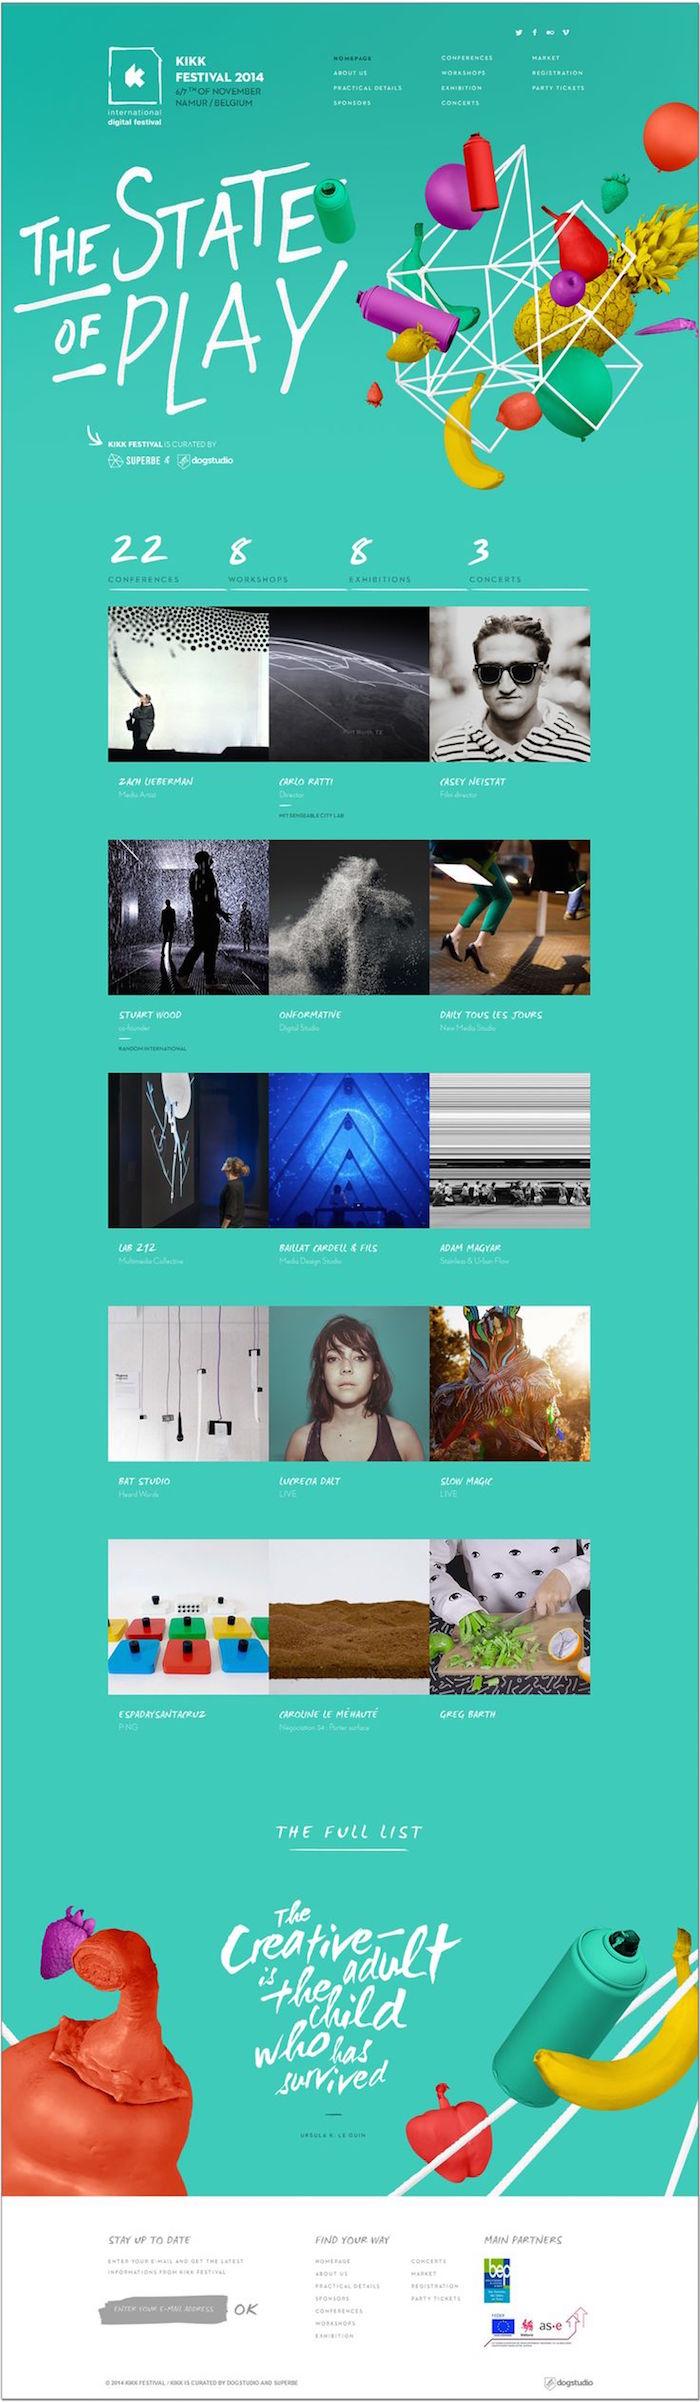 diseños web diciembre 2014 img 11